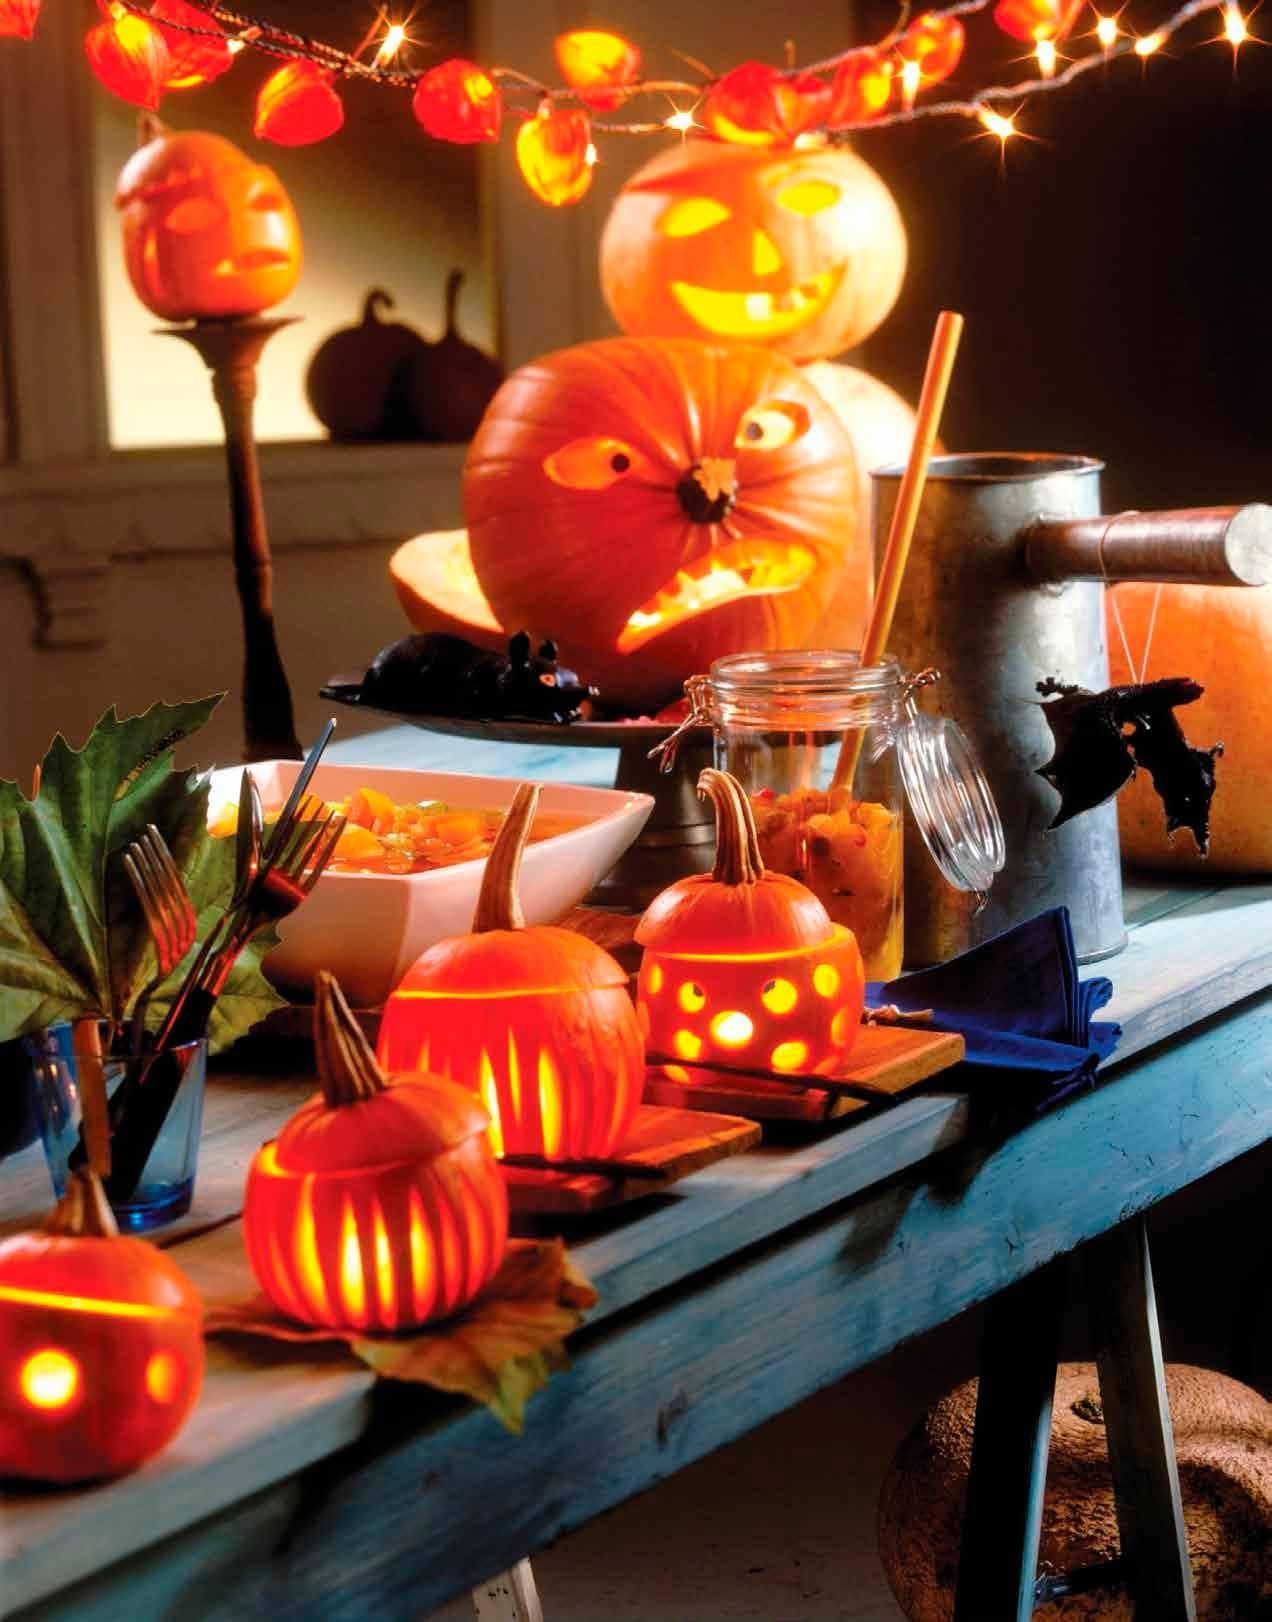 Spooky Night! Halloween